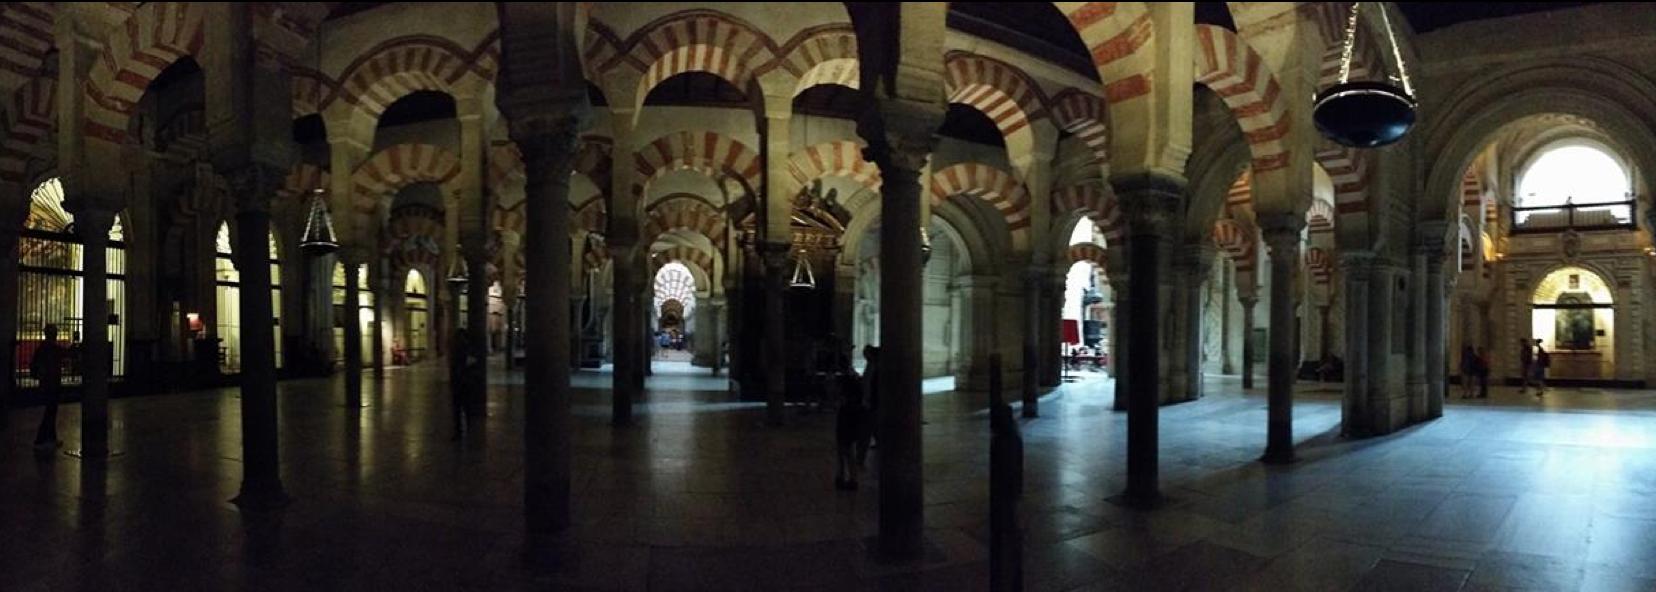 Catedral Cordoba © Loulou Picasso